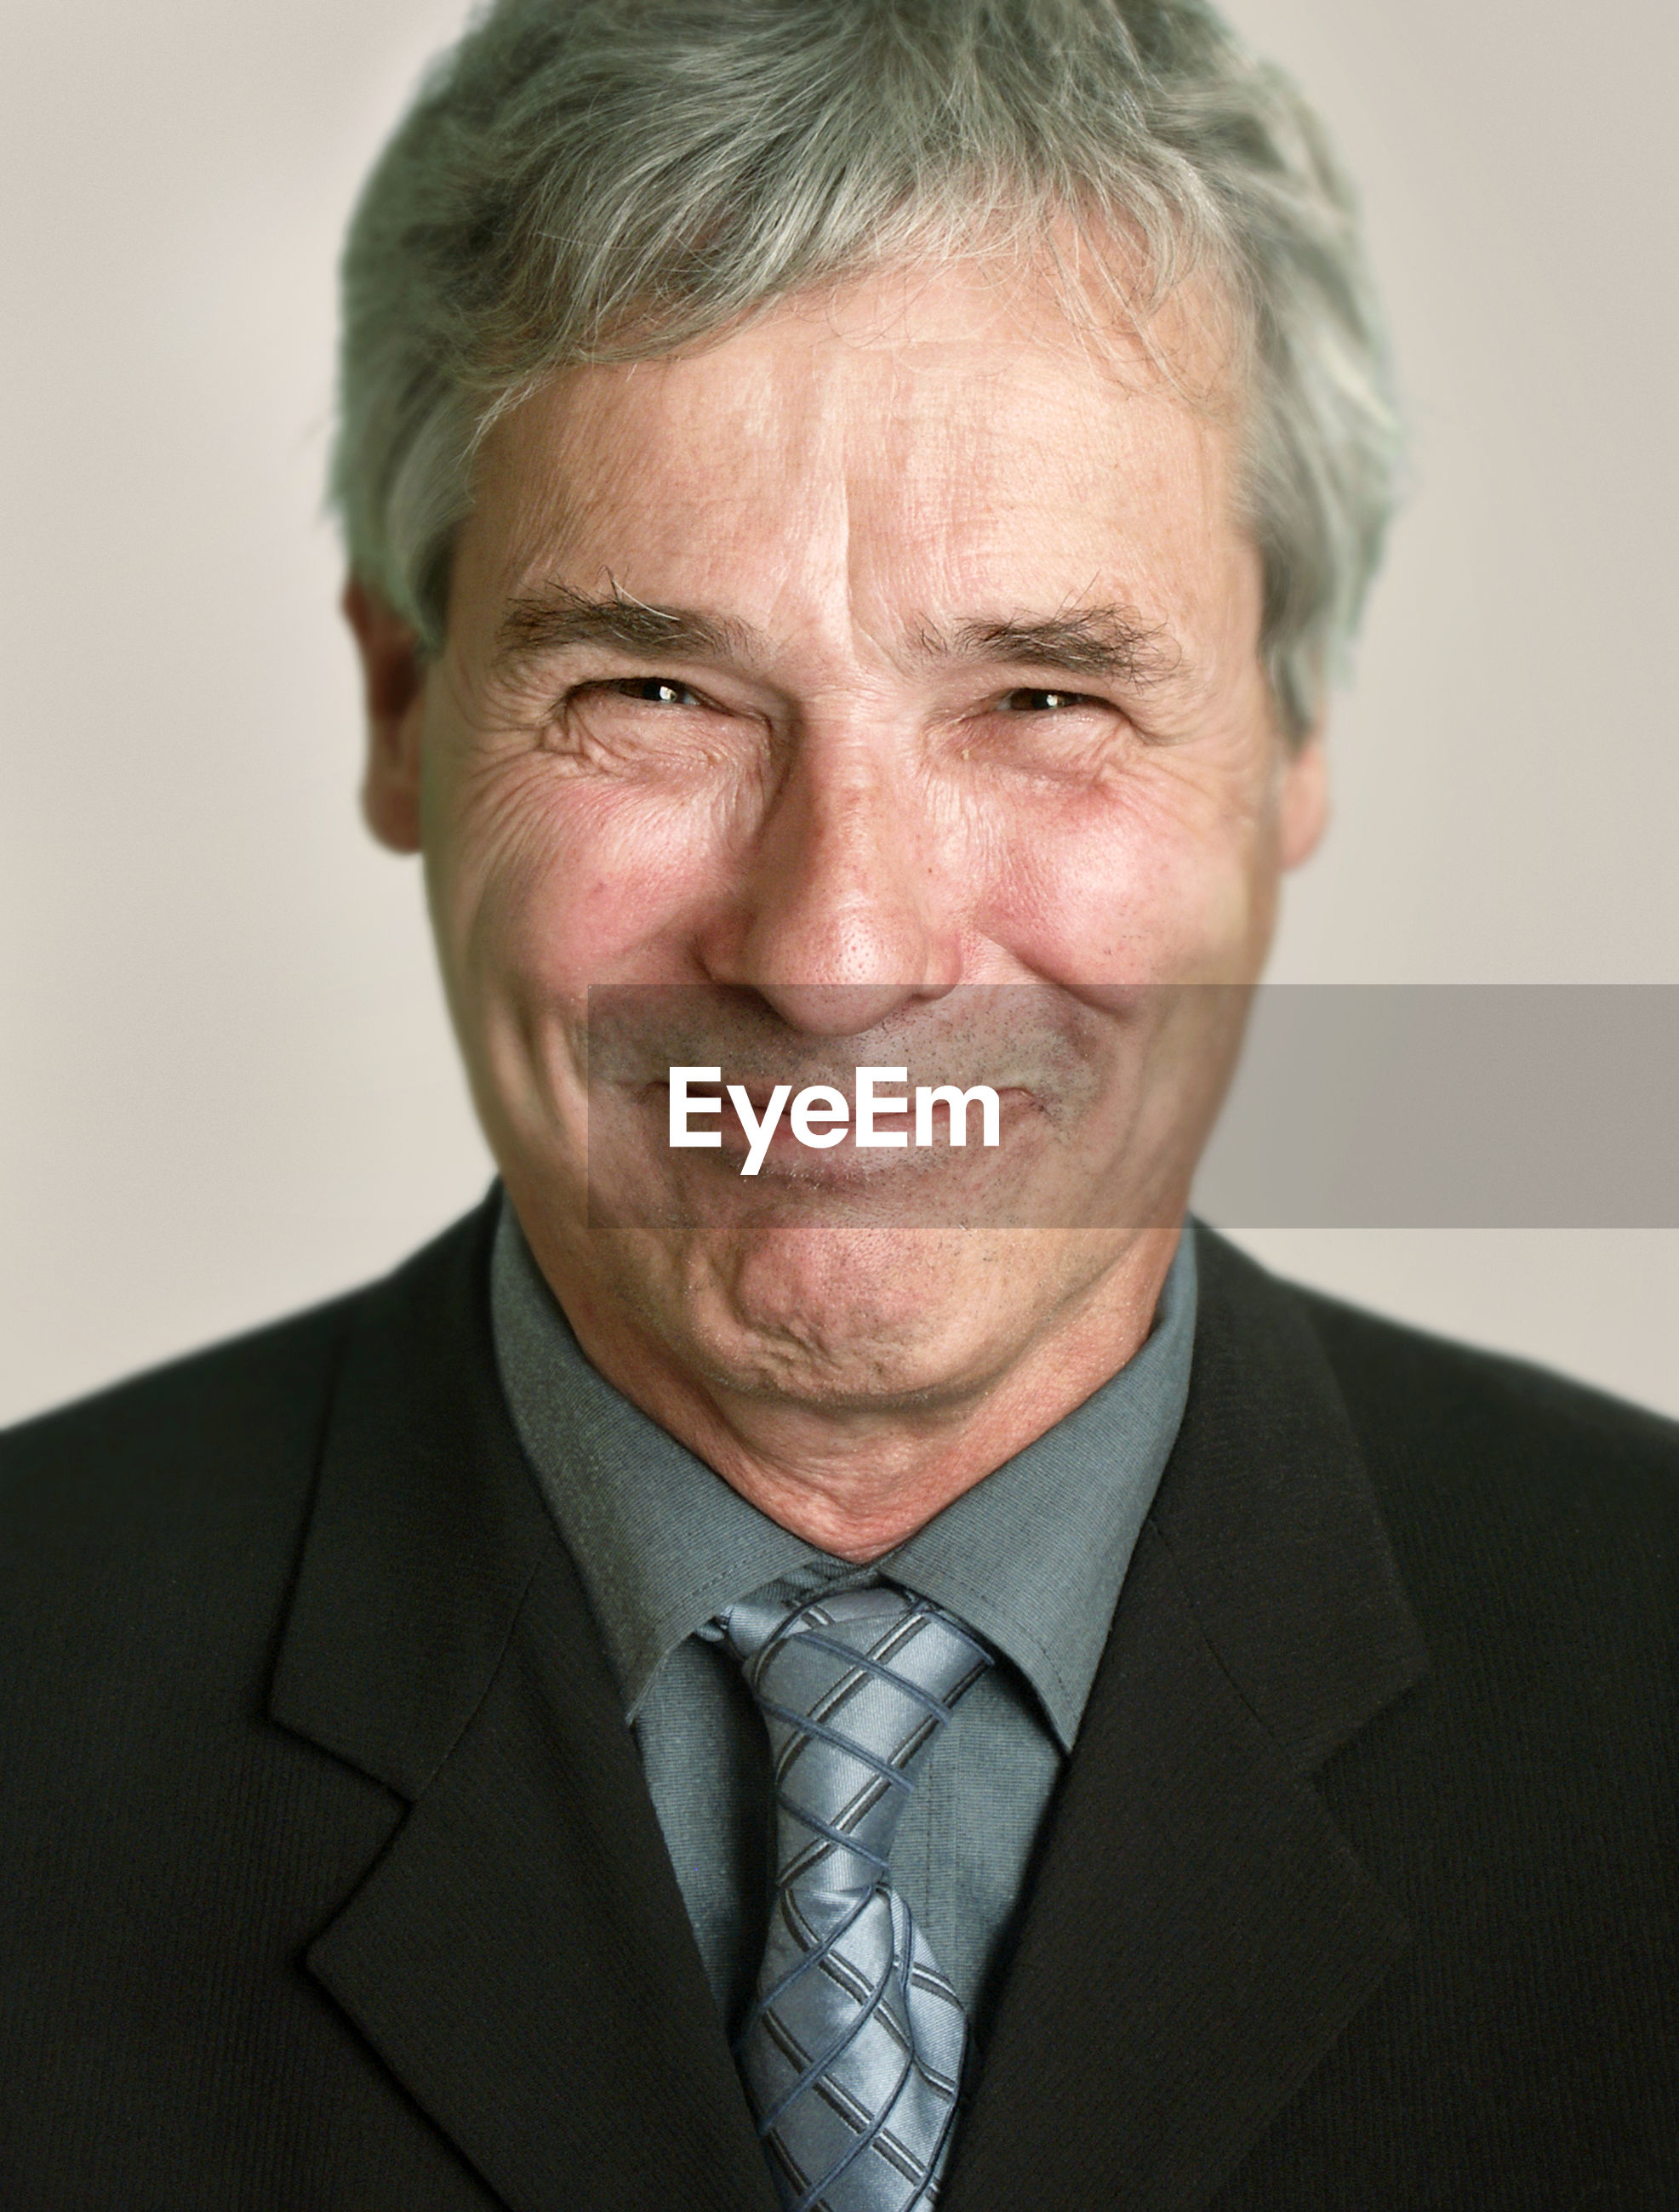 Close-up portrait of smiling senior man against gray background